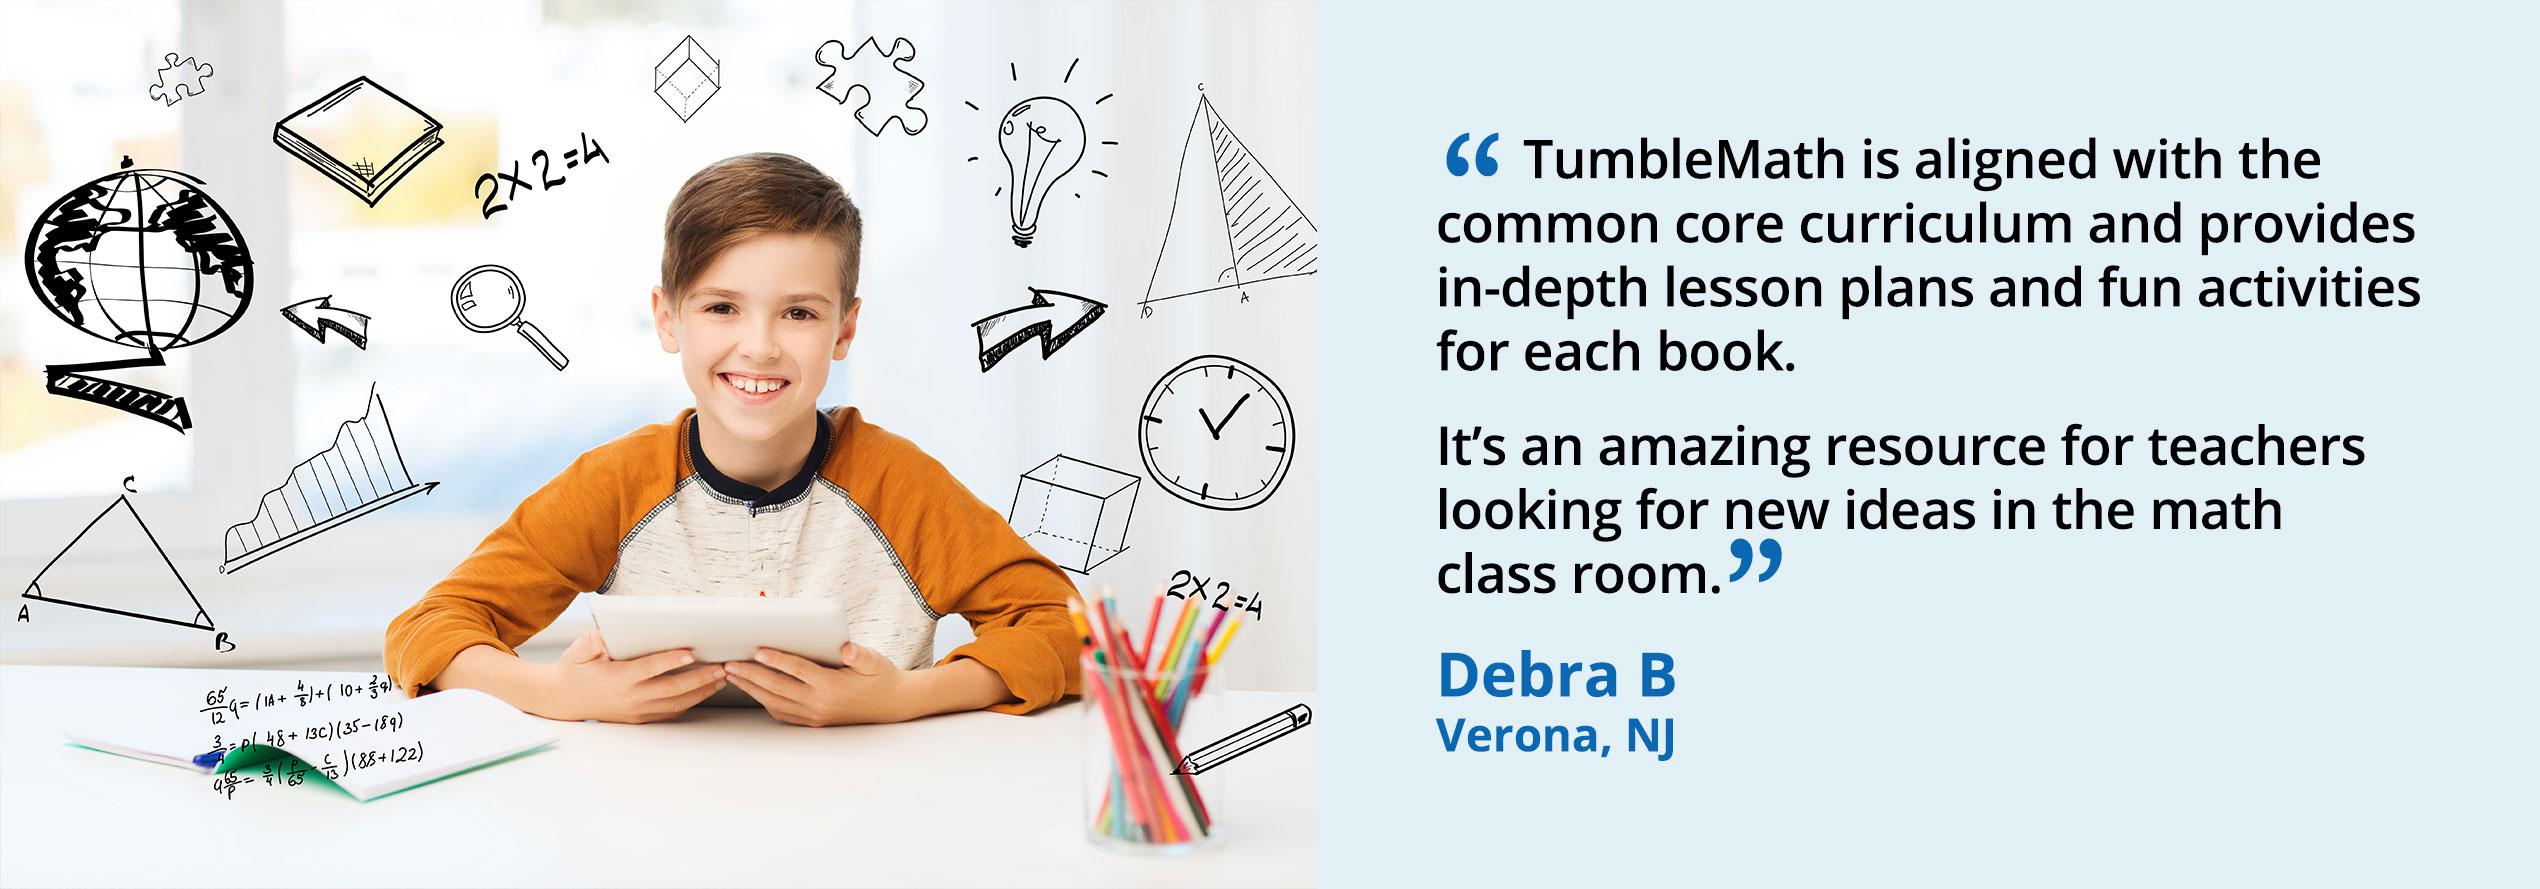 TumbleMath